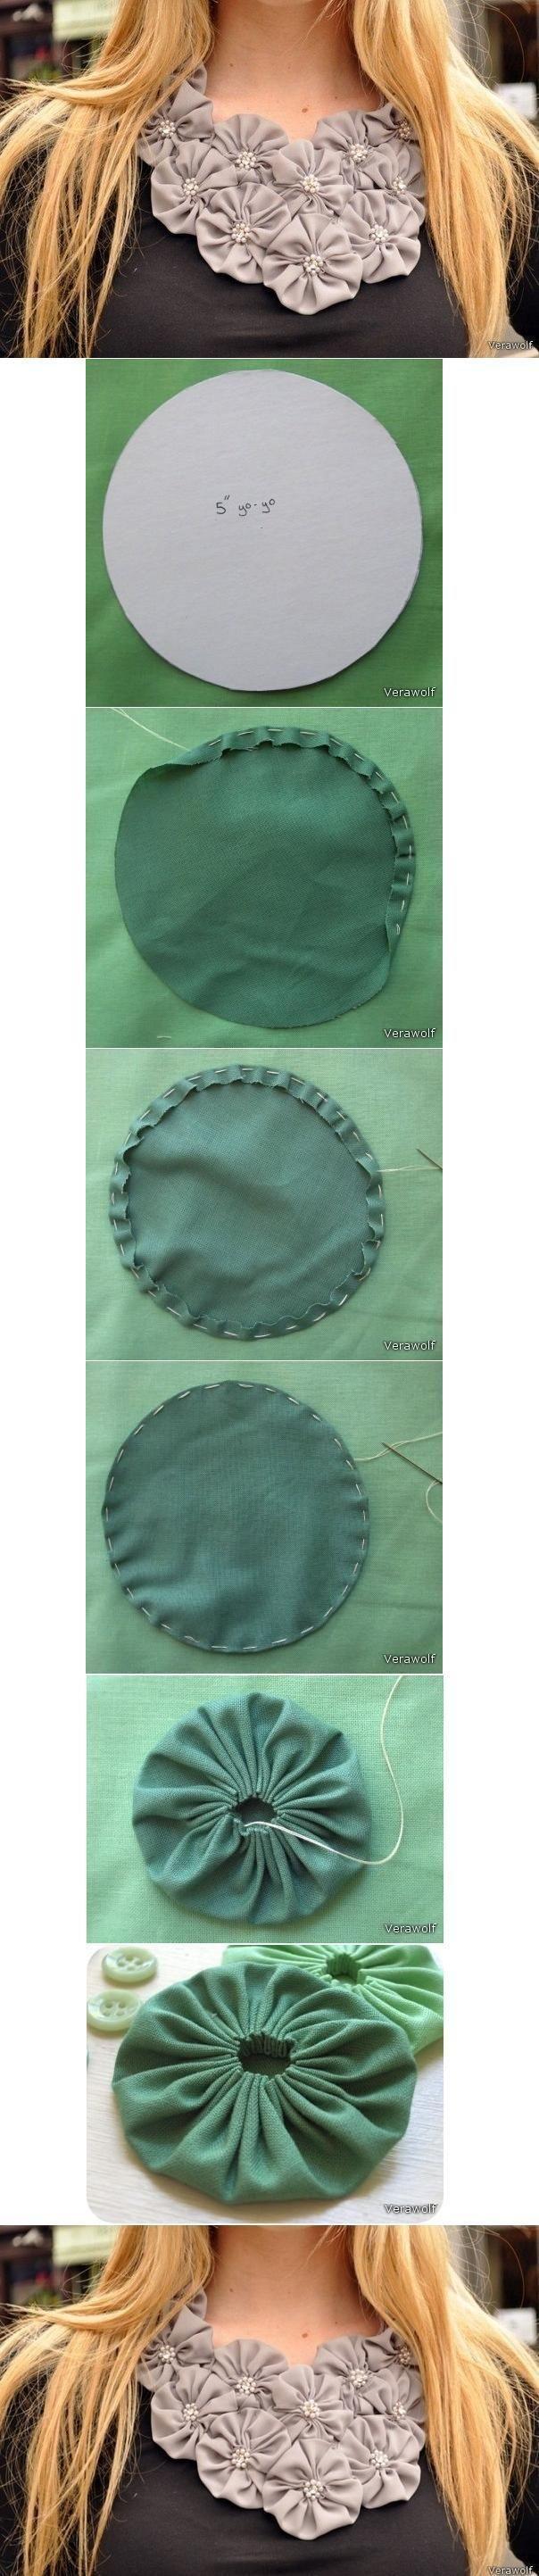 DIY Tutorial DIY Fabric Flowers / DIY Fabric Flower Ornament - Bead&Cord